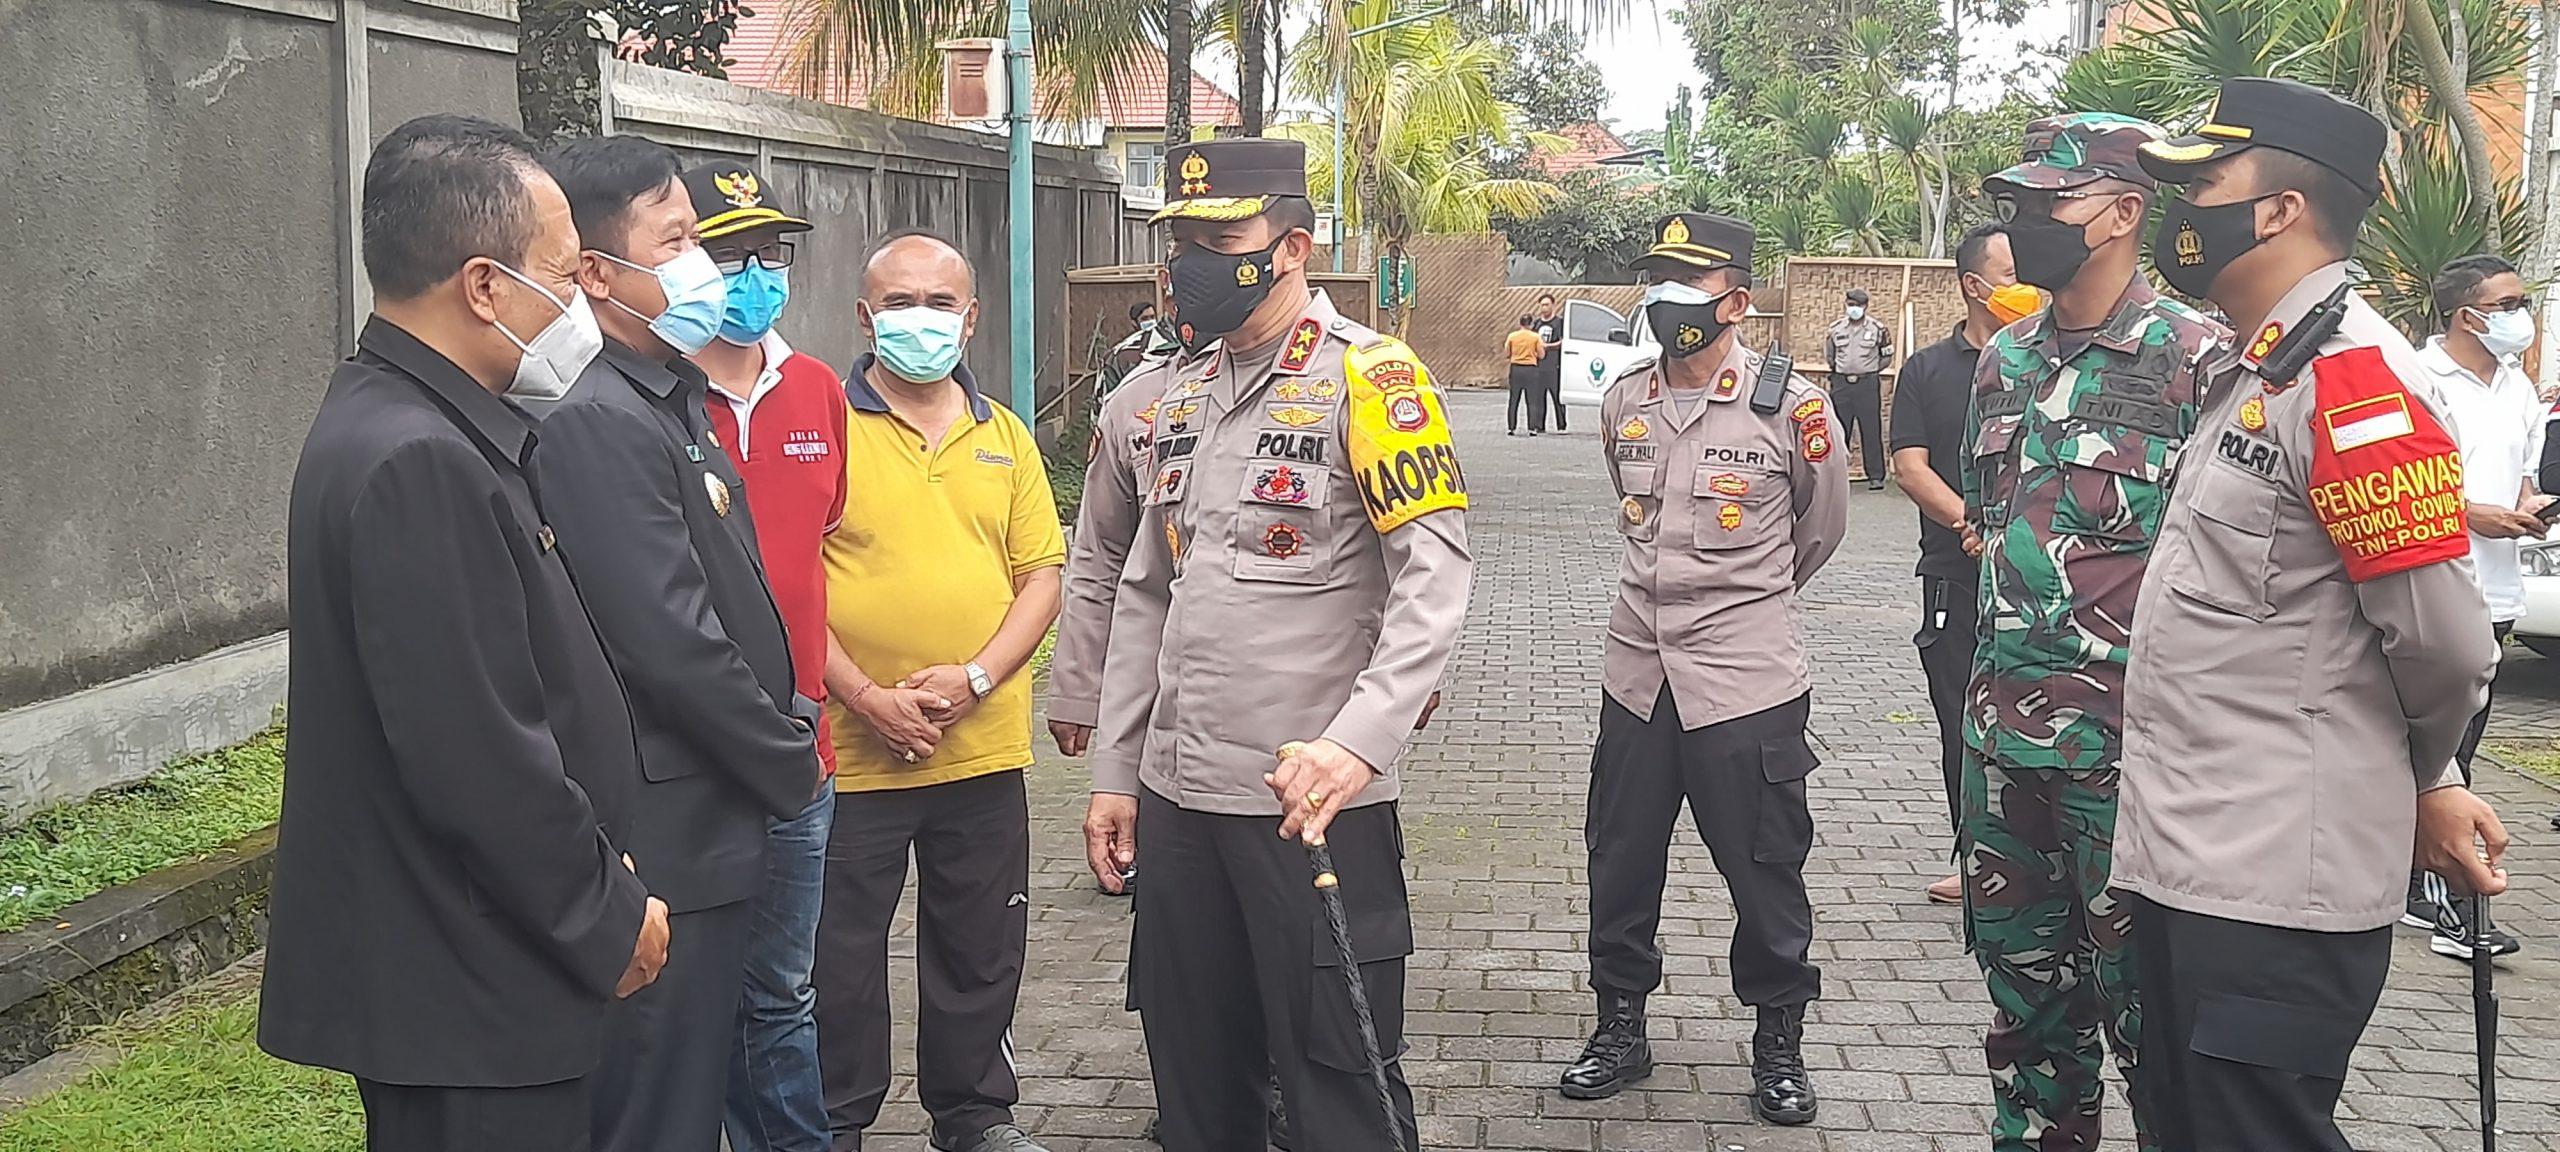 KAPOLDA Bali, Irjen Putu Jayan Danu Putra, meninjau isoter desa di Banjar Bunutin, Desa Bunutin, Kecamatan Bangli, Jumat (20/8/2021). Foto: ist